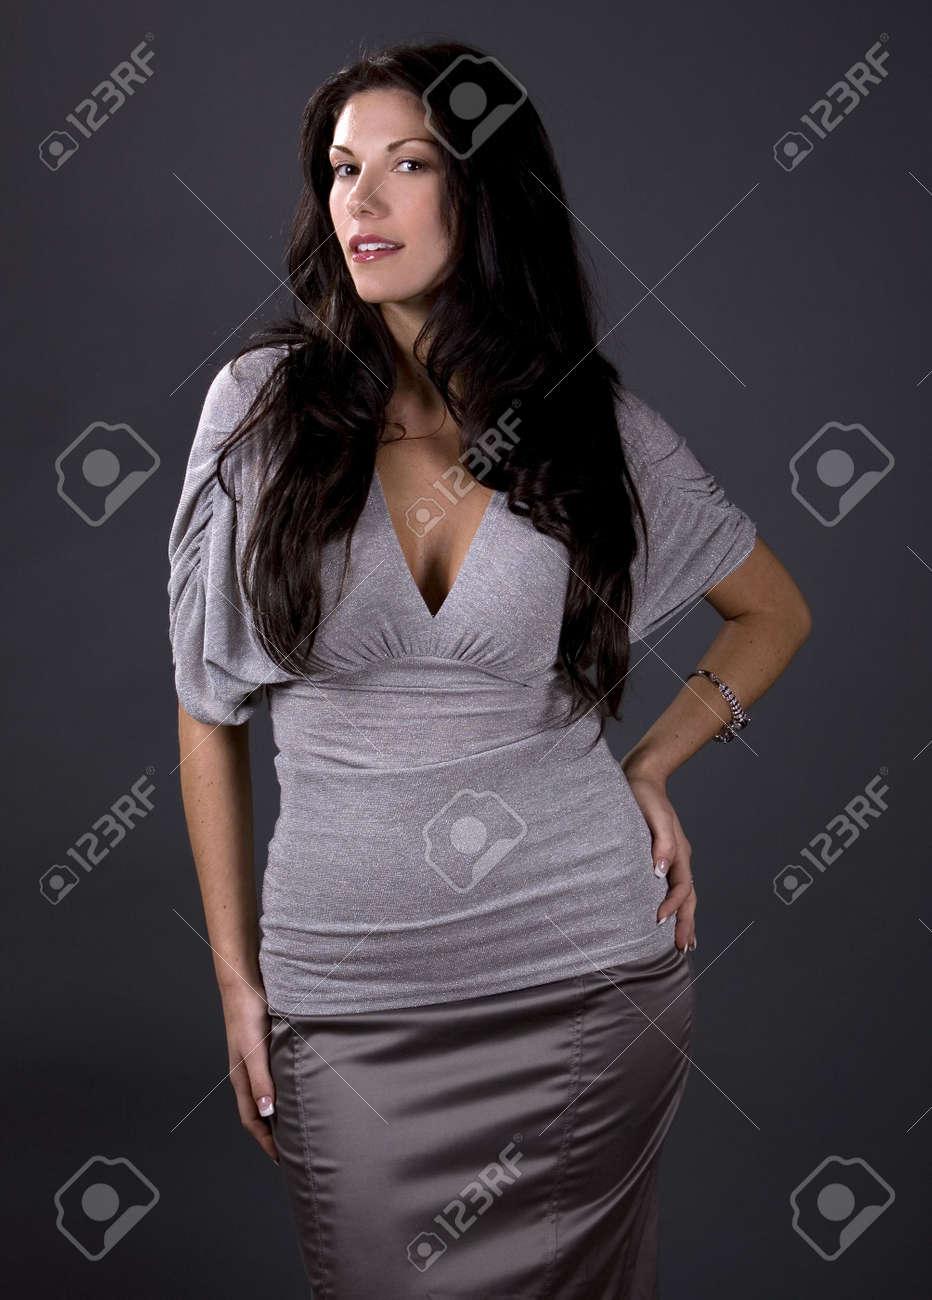 stunning woman wearing grey fashion top and skirt Stock Photo - 2127913